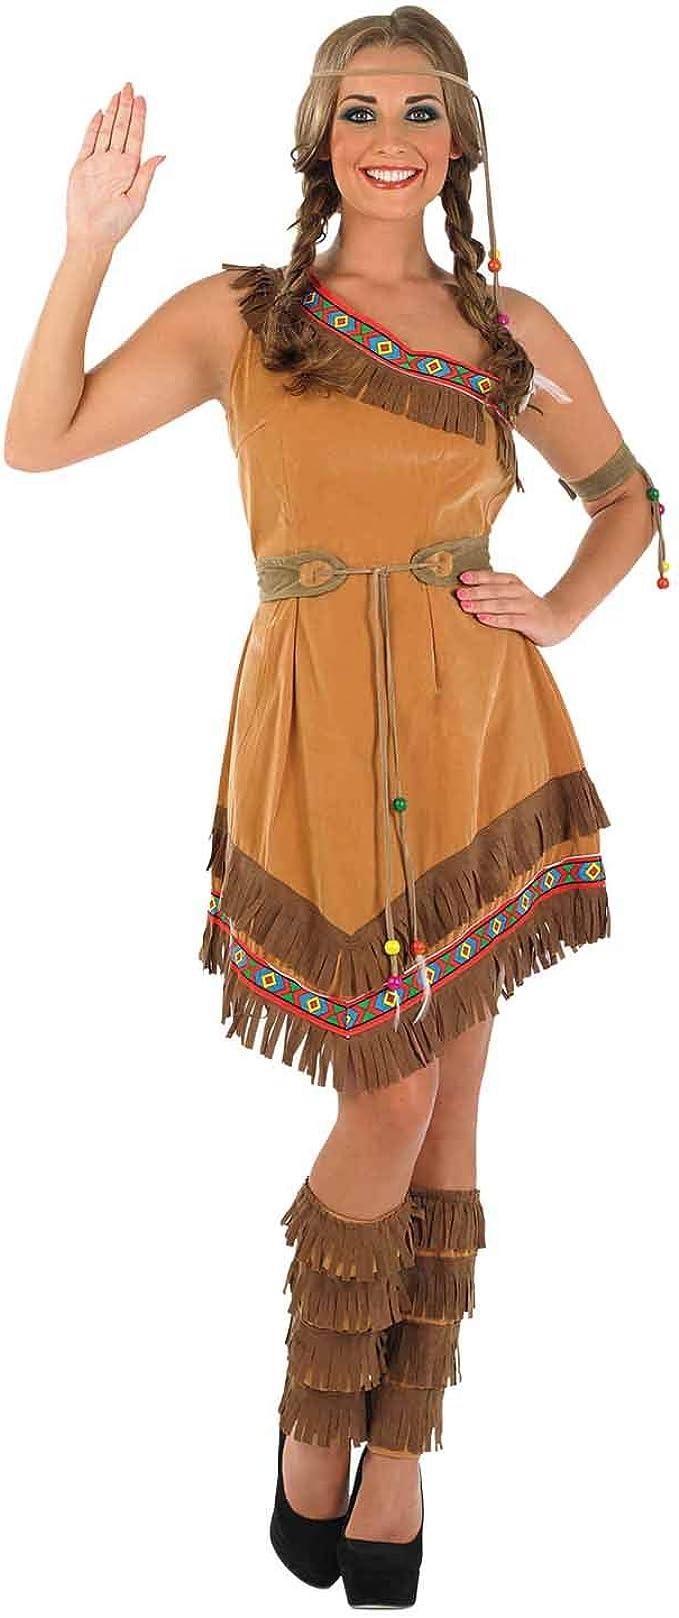 Amazon.com: Disfraz vikingo para mujer, para adultos ...